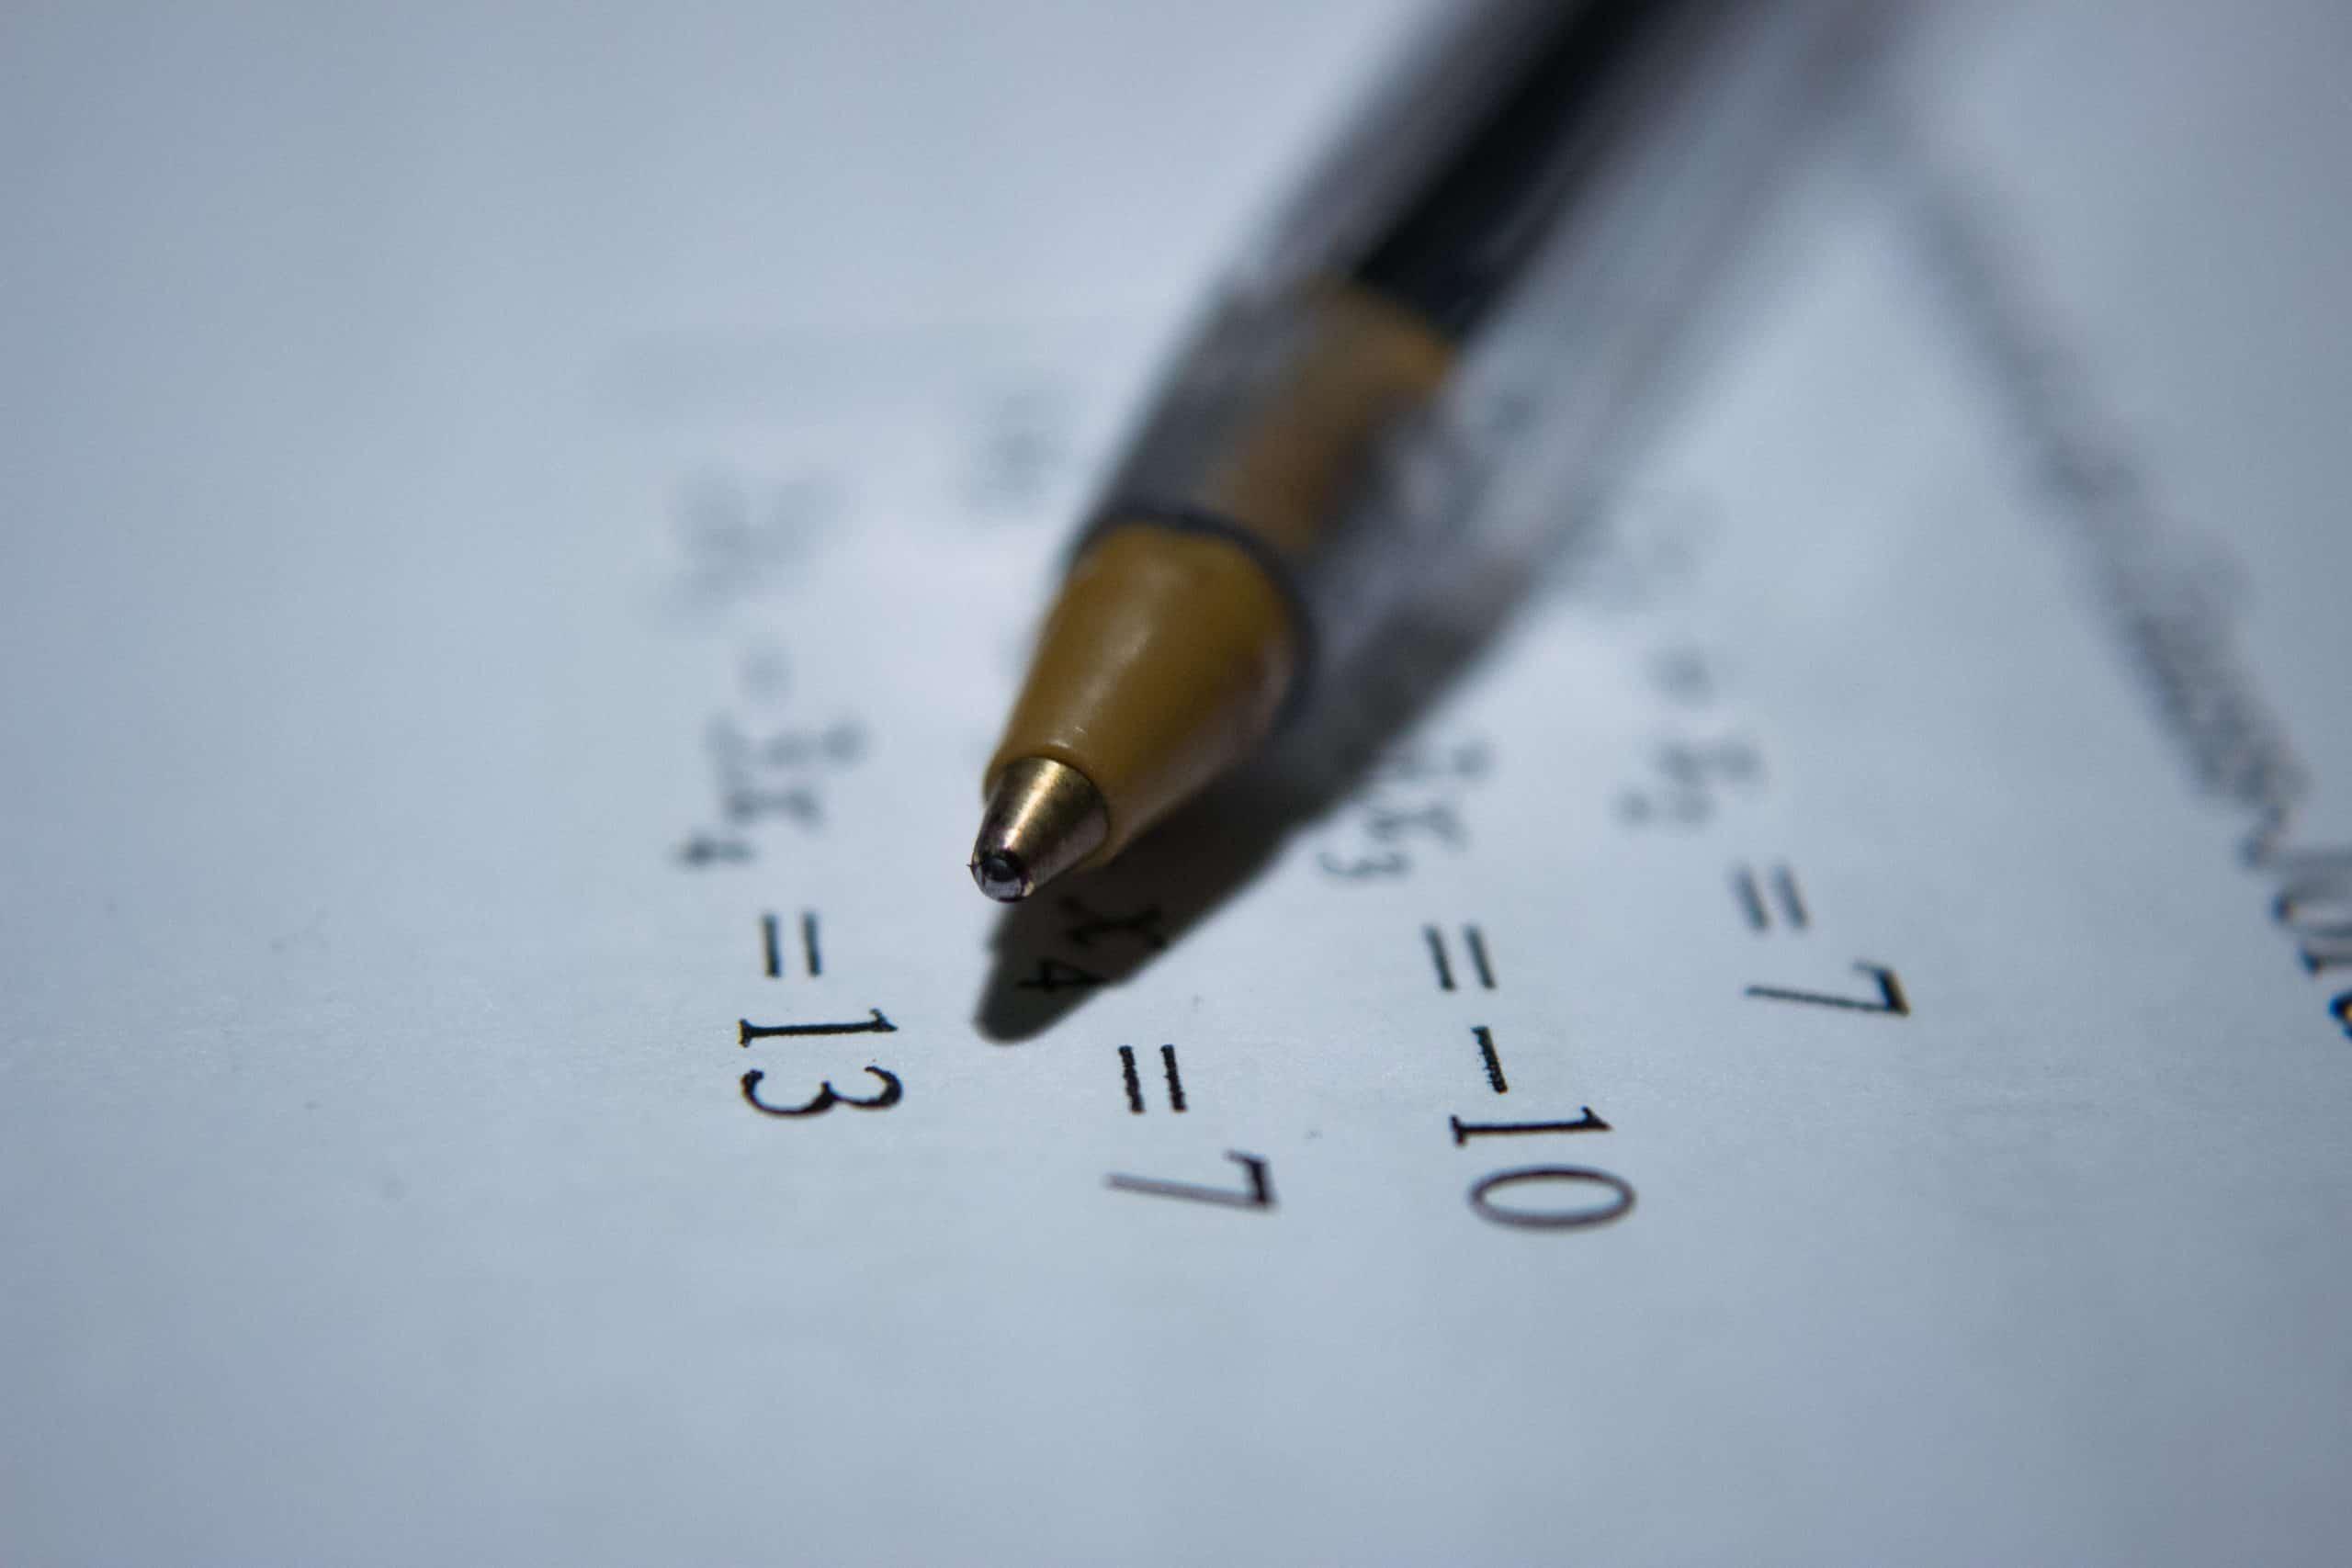 Best Multivariable Calculus course tutorial class certification training online